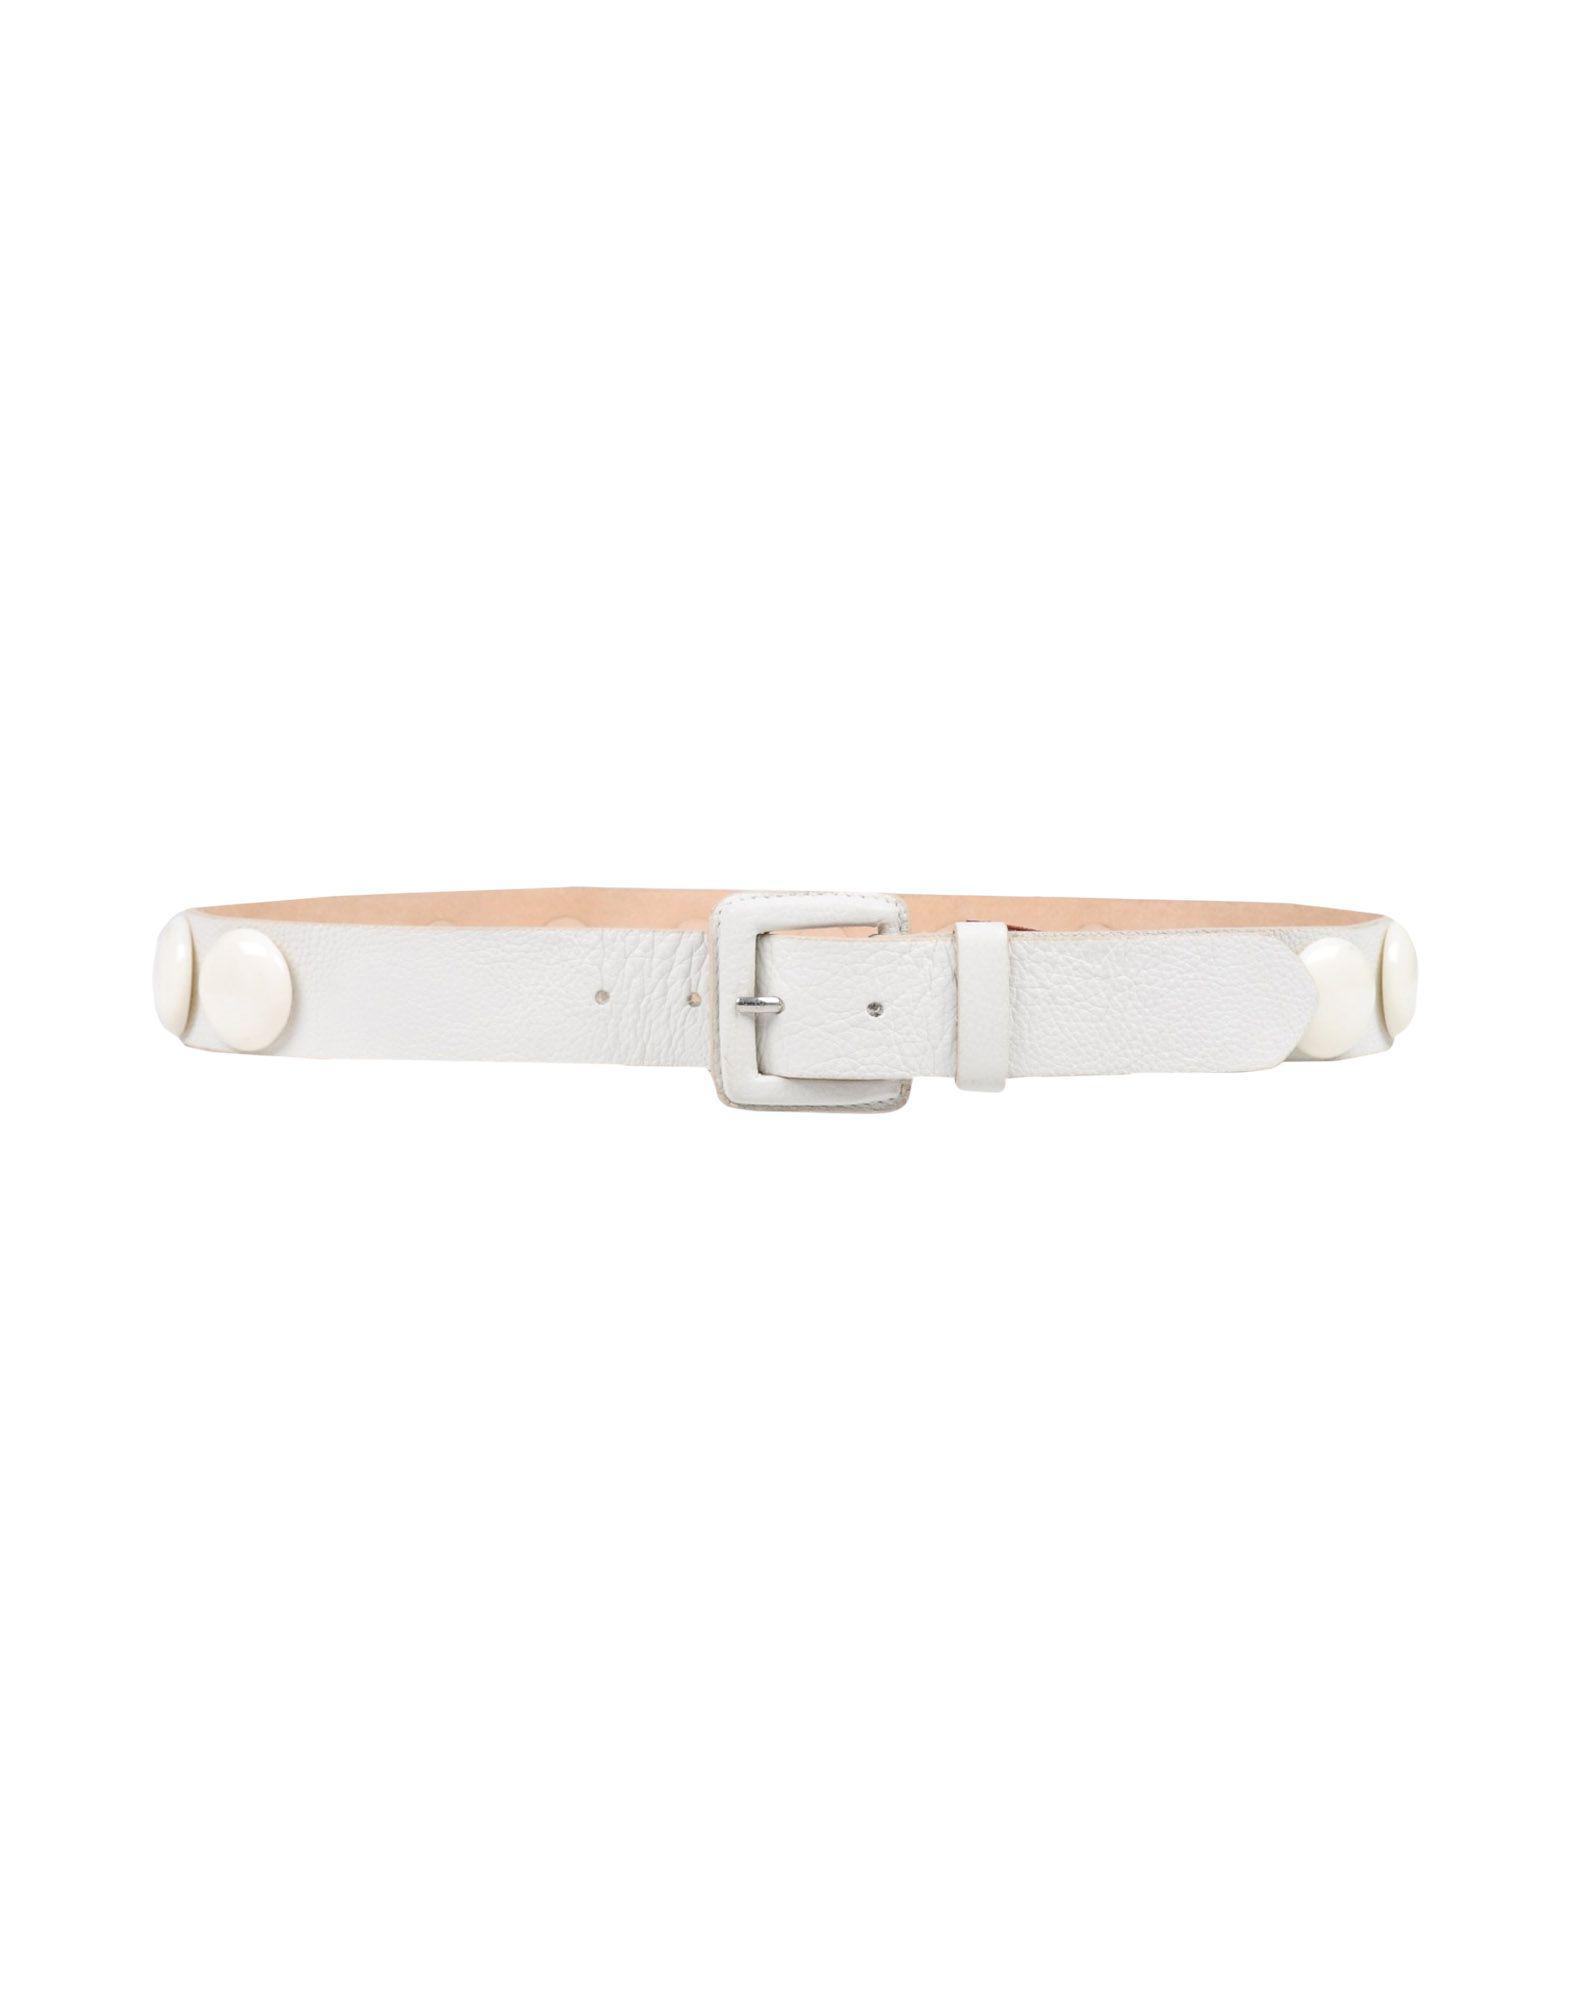 Small Leather Goods - Belts Osklen FHrqm9LM2Z